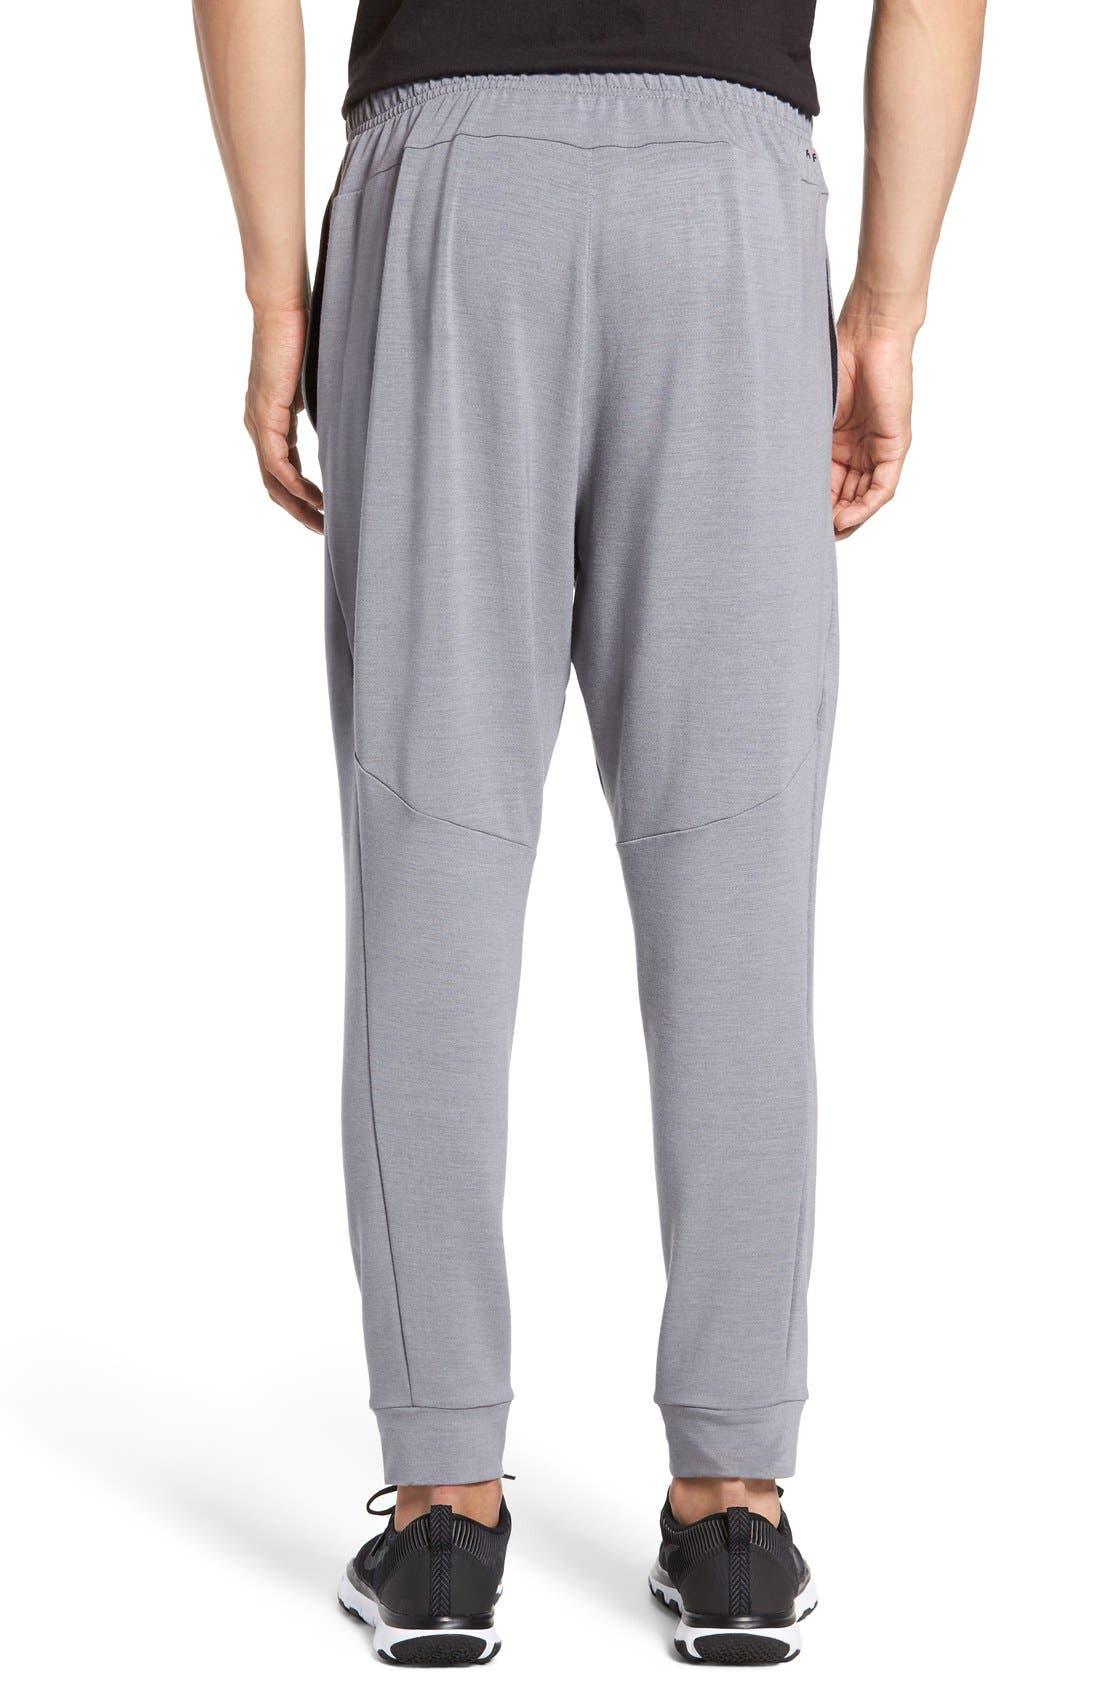 Dri-FIT Fleece Training Pants,                             Alternate thumbnail 4, color,